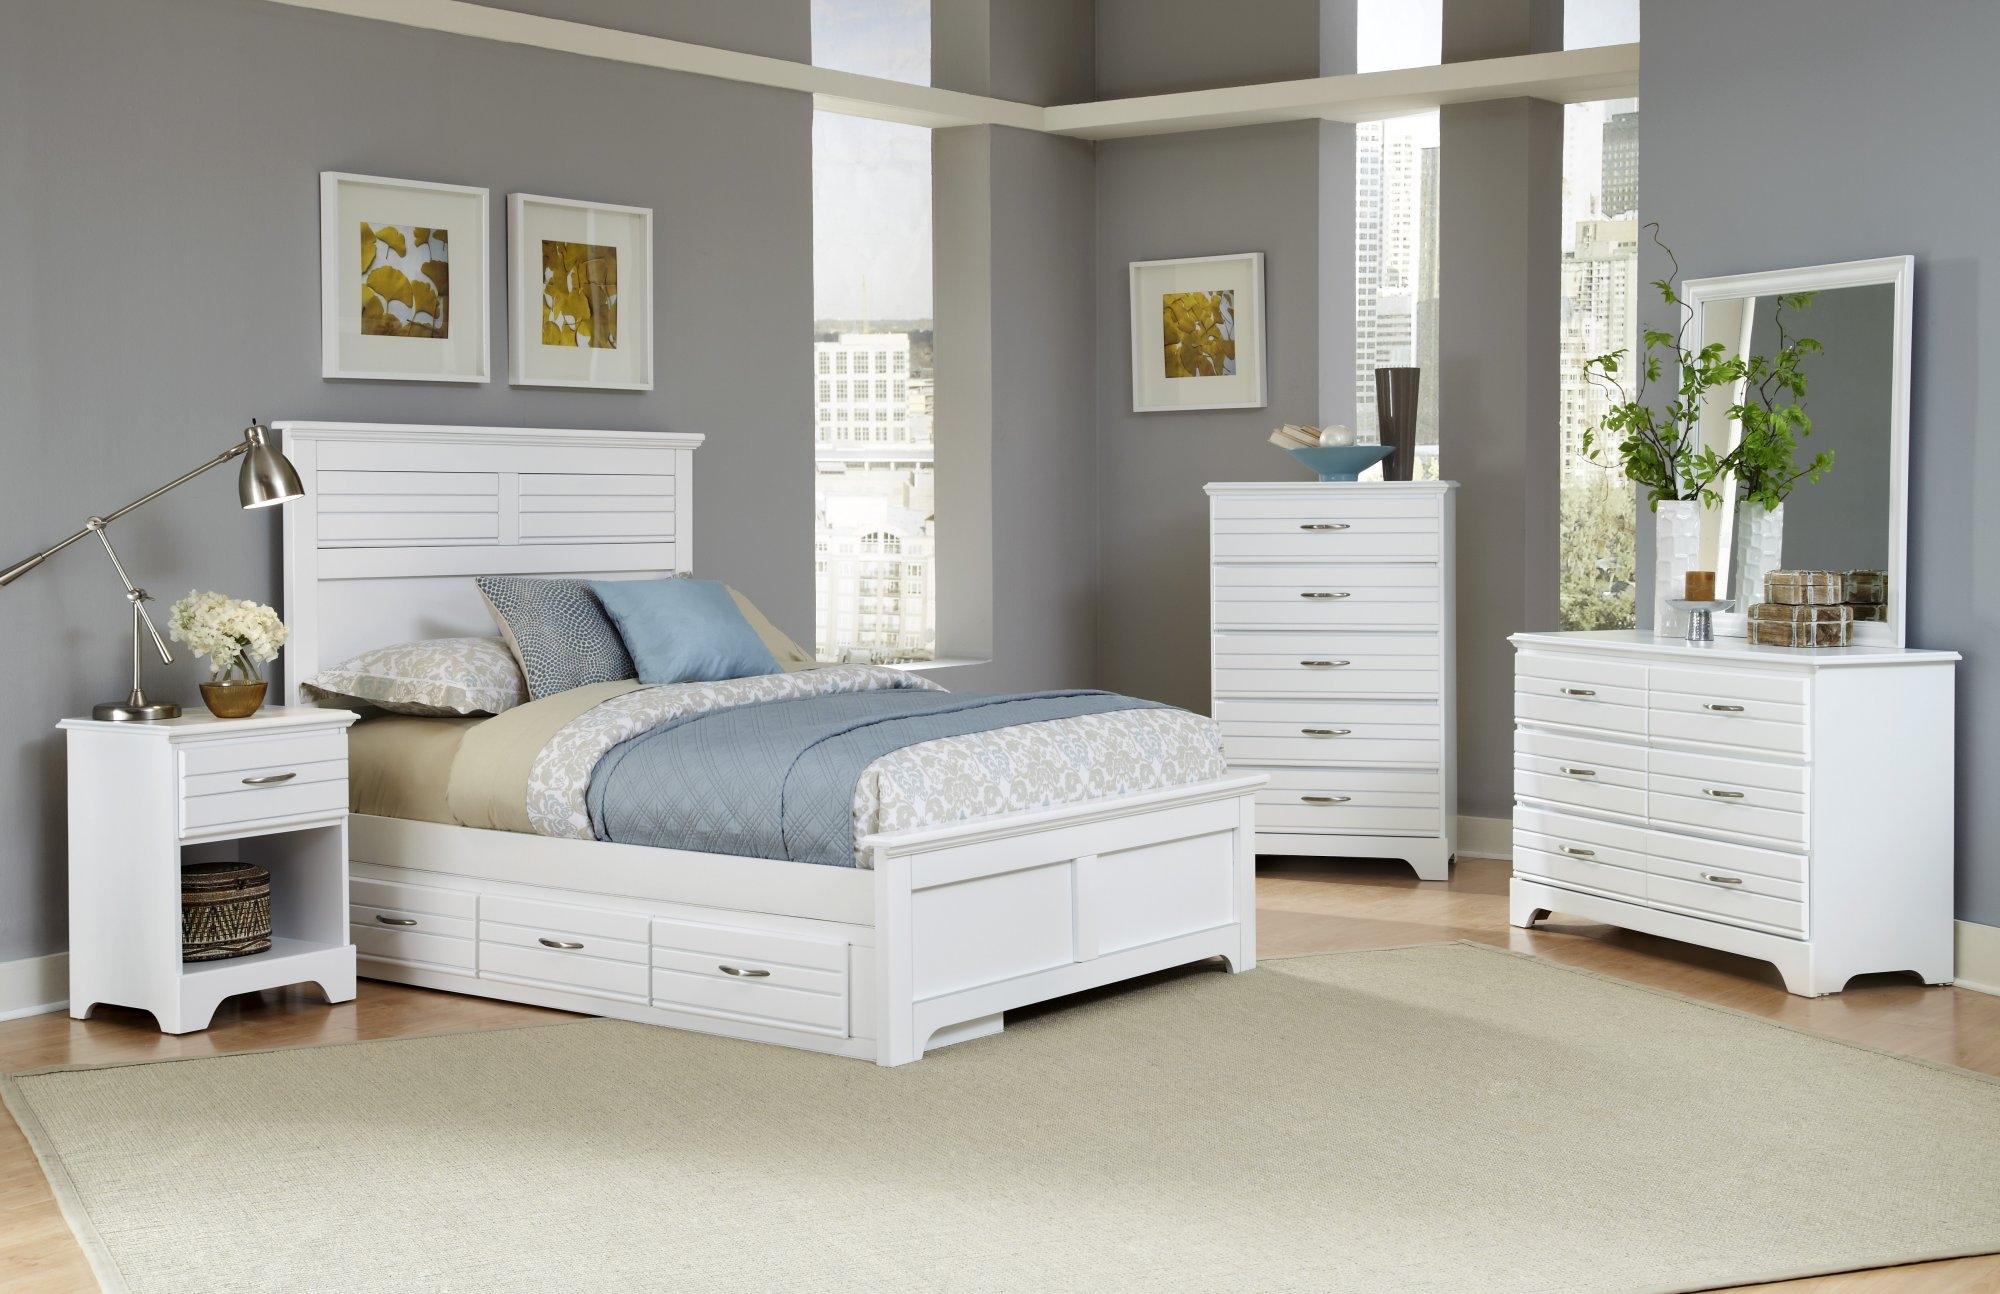 Carolina Furniture Platinum Series White Bedroom Collection